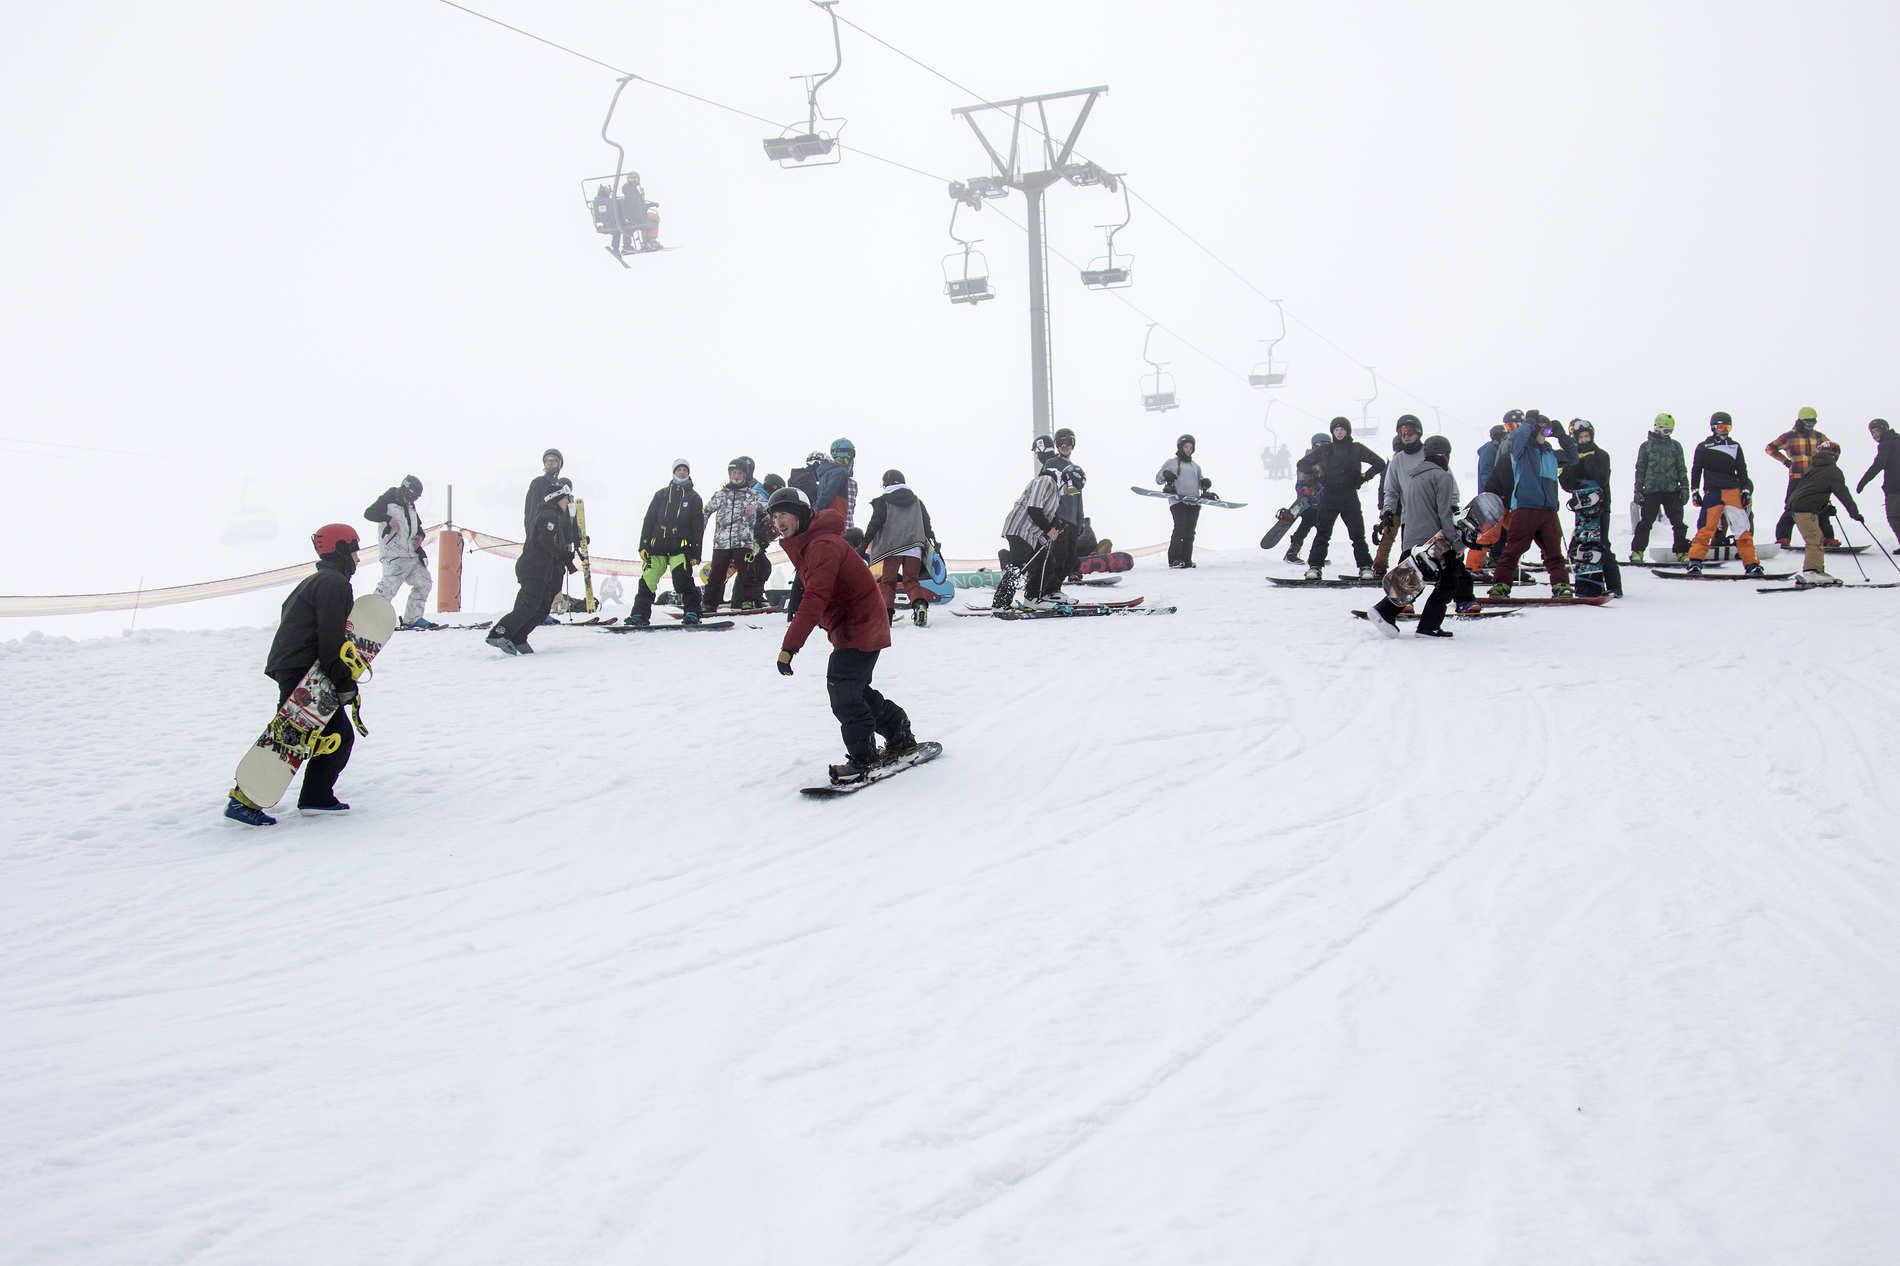 web snowpark feldberg 17 03 2018 lifestyle fs sb martin herrmann qparks 31